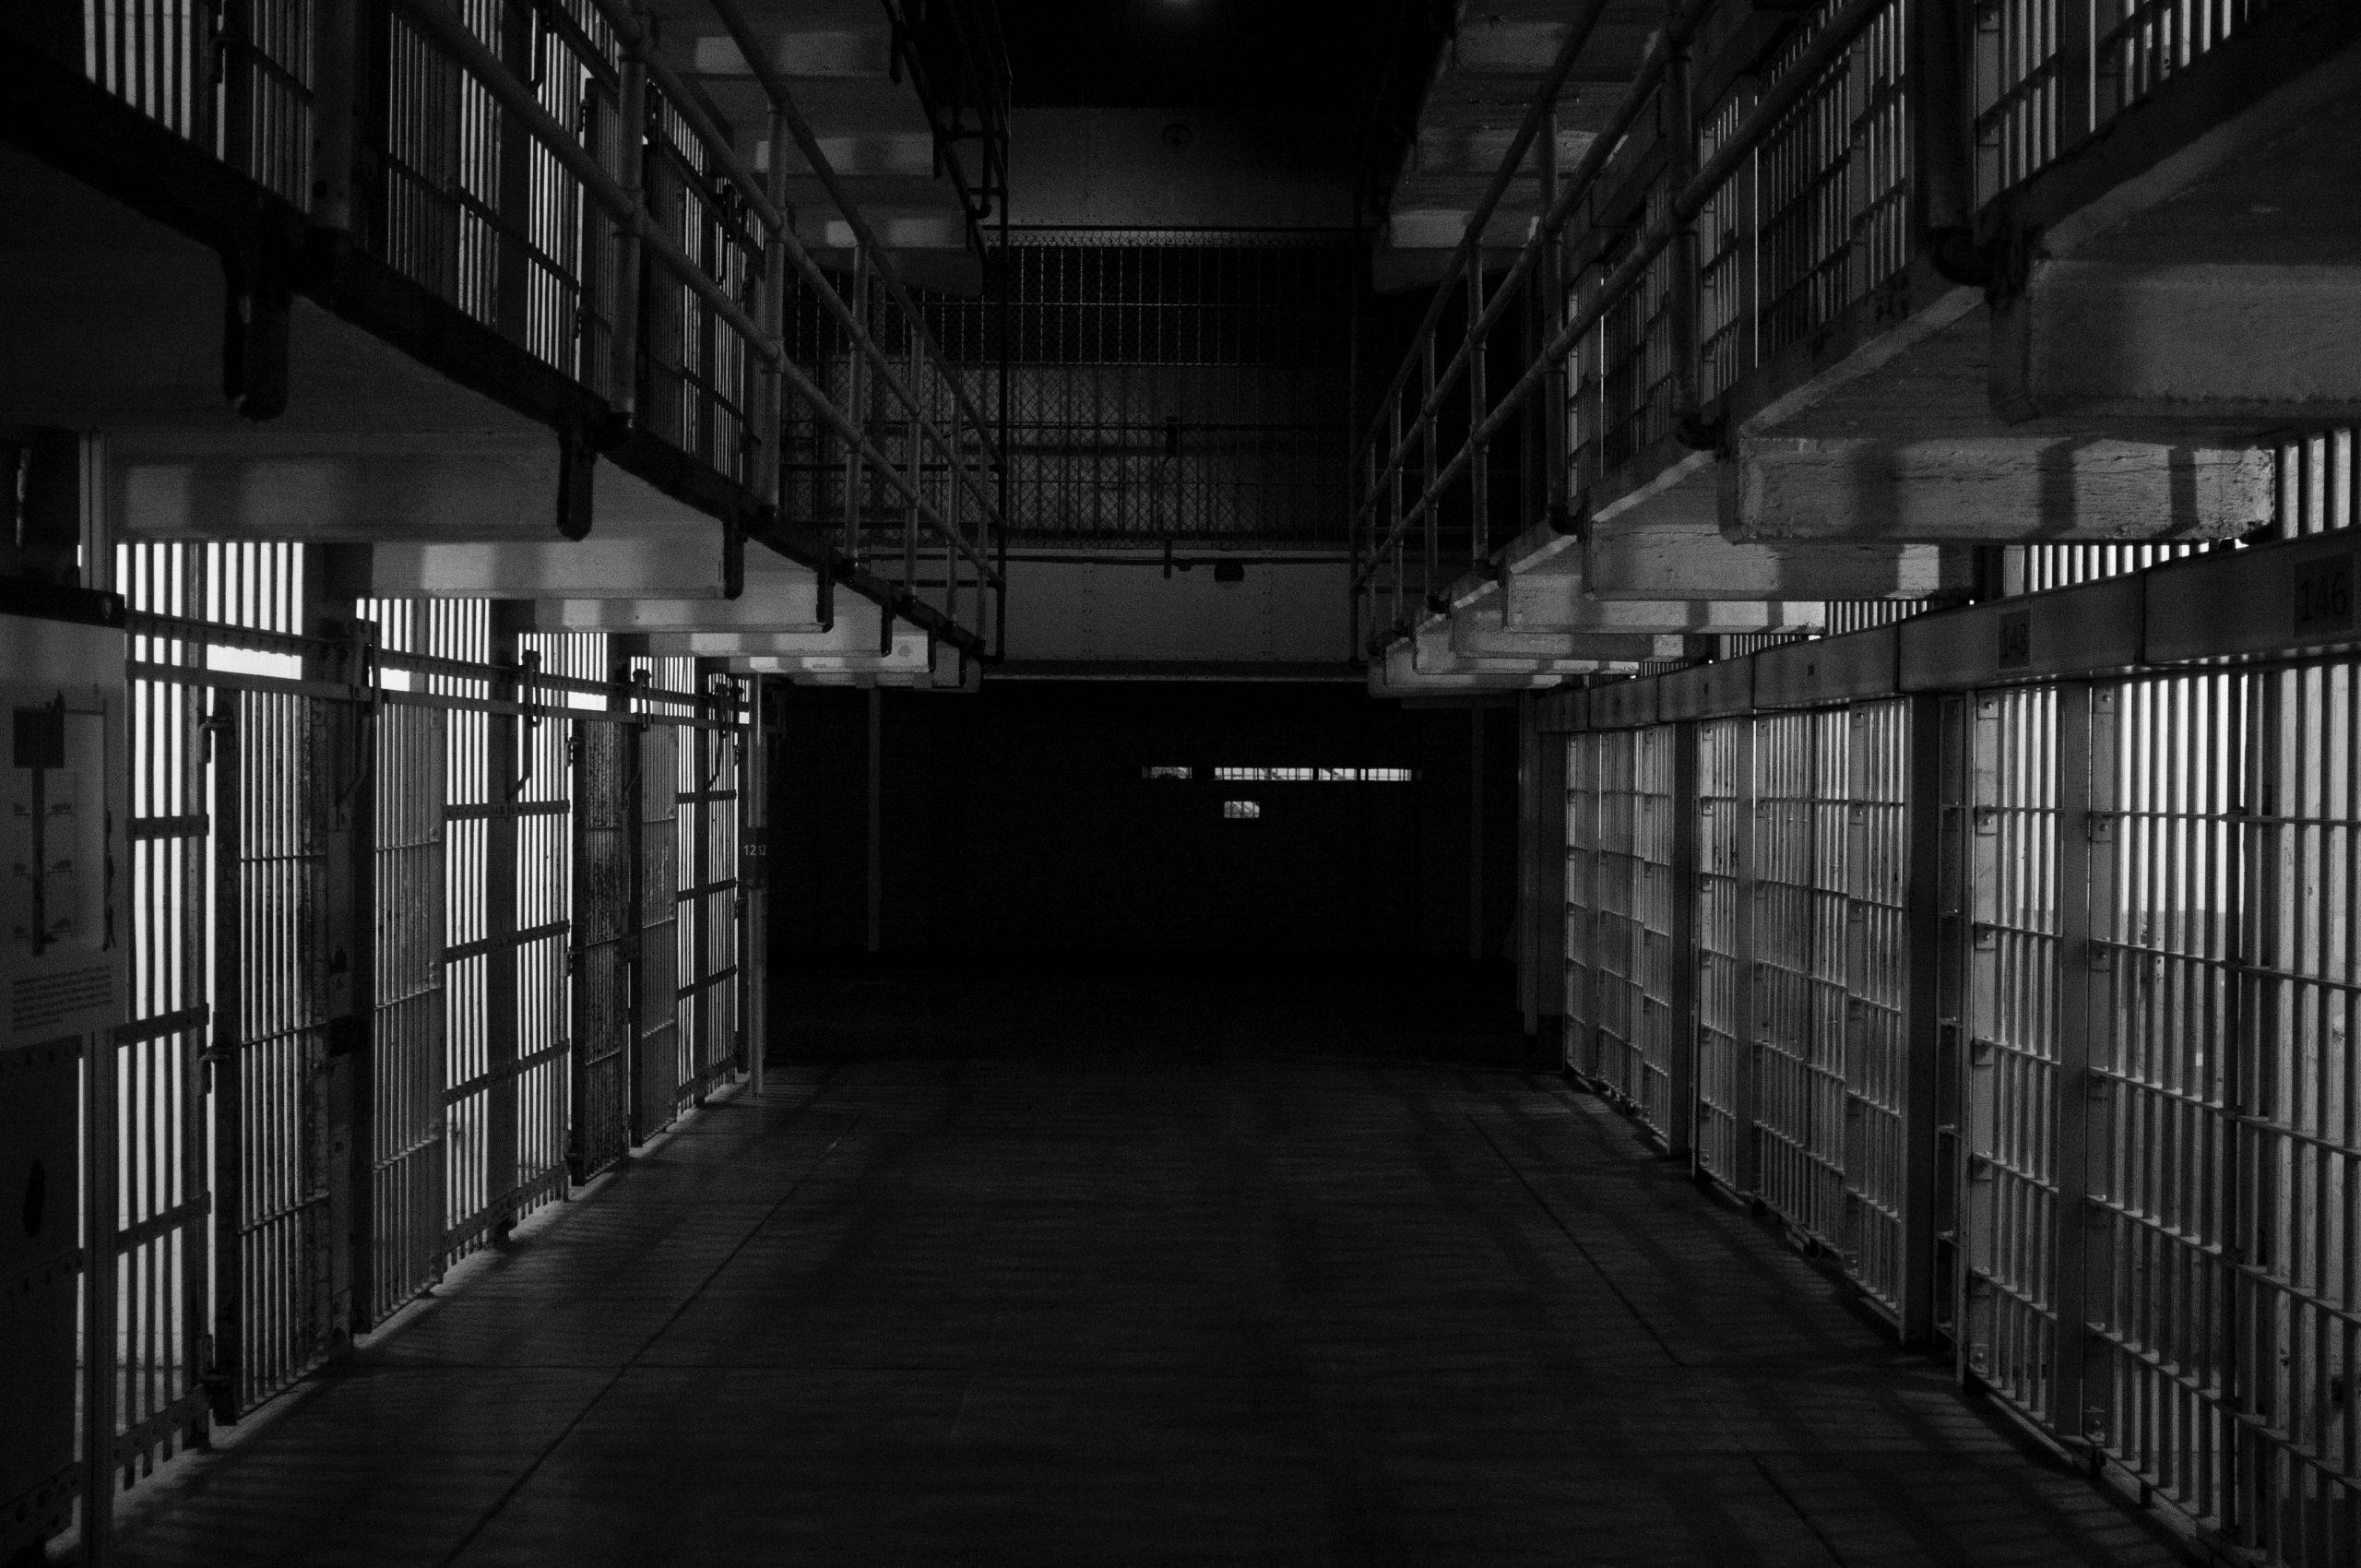 carcere amore